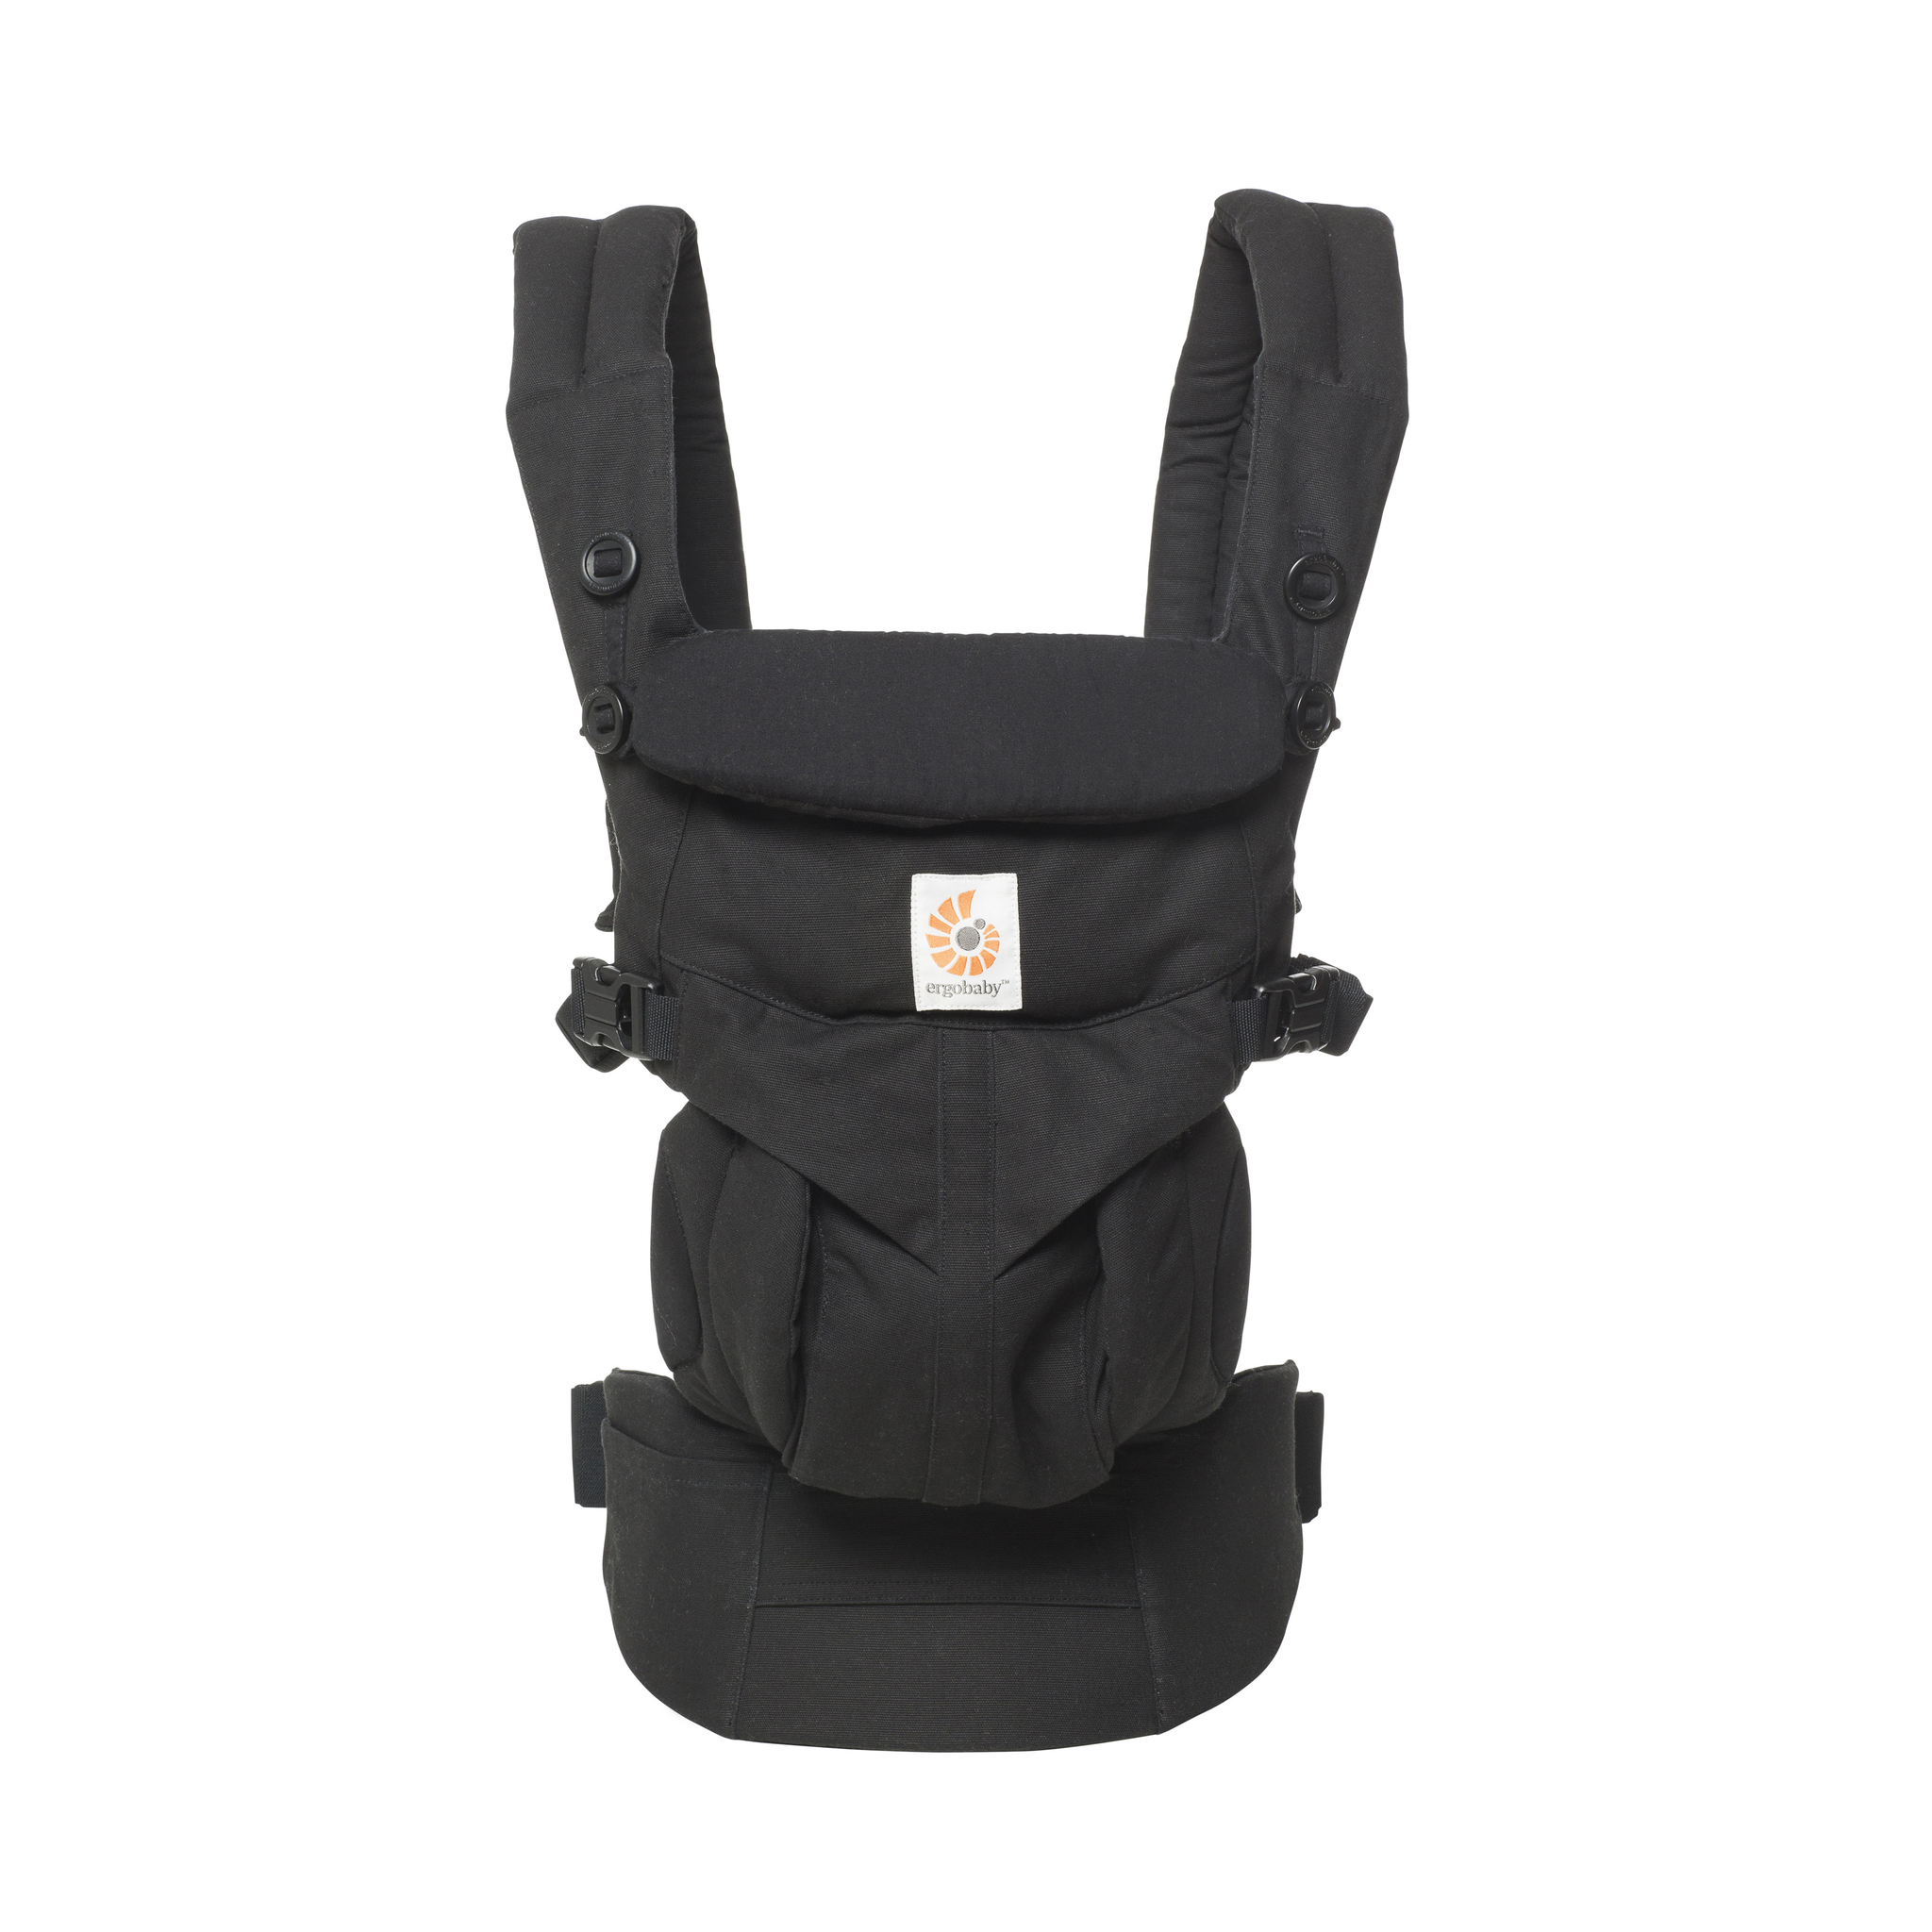 Рюкзак-Кенгуру Omni 360 Cool (4 Position)